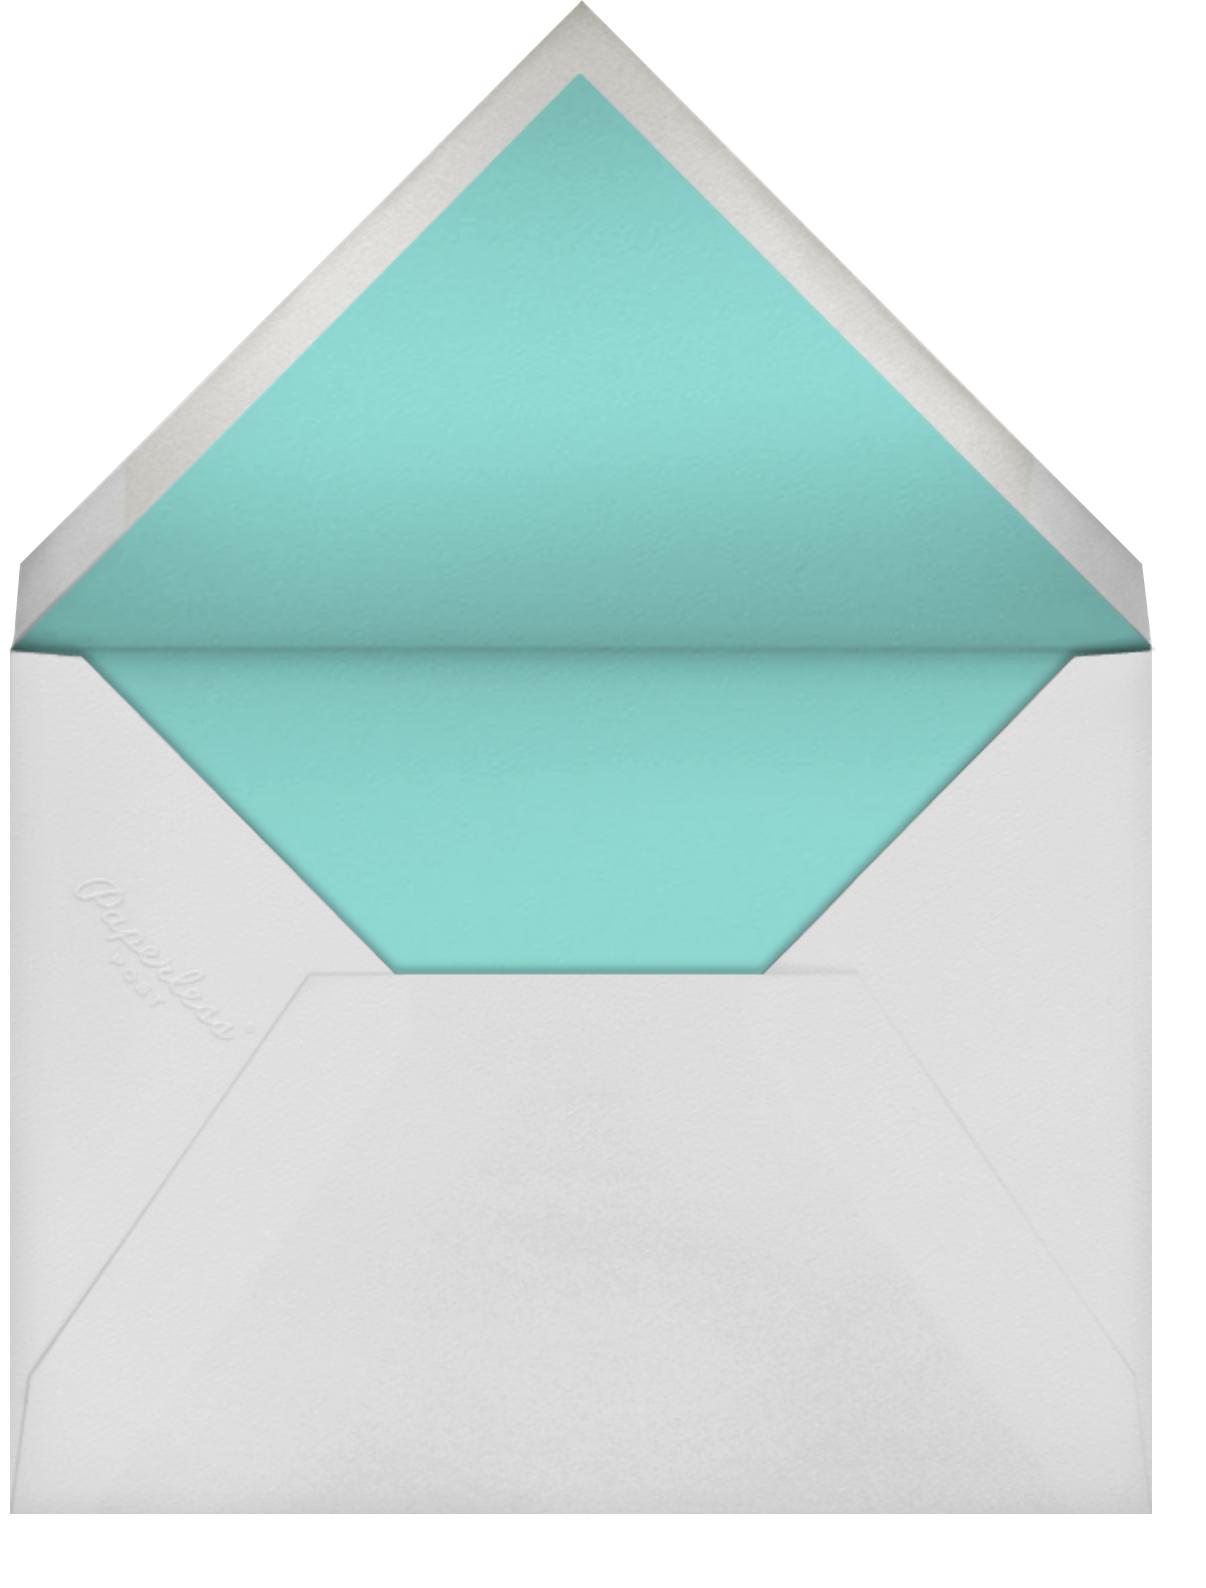 Ocean Wave - Gray Malin - Summer entertaining - envelope back